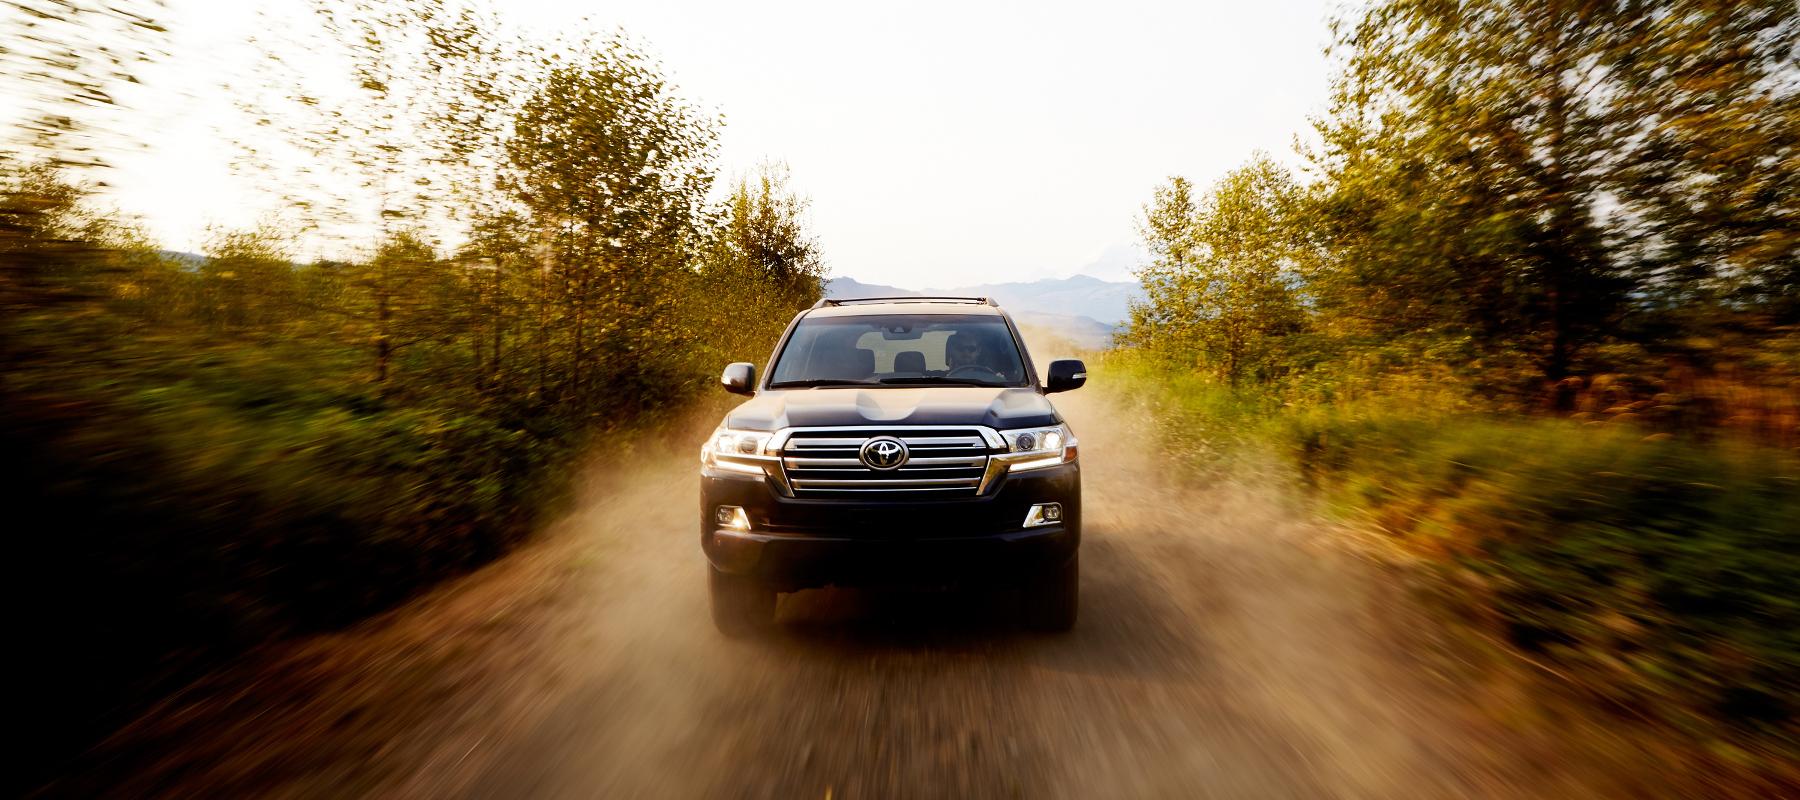 Toyota Land Cruiser Driving